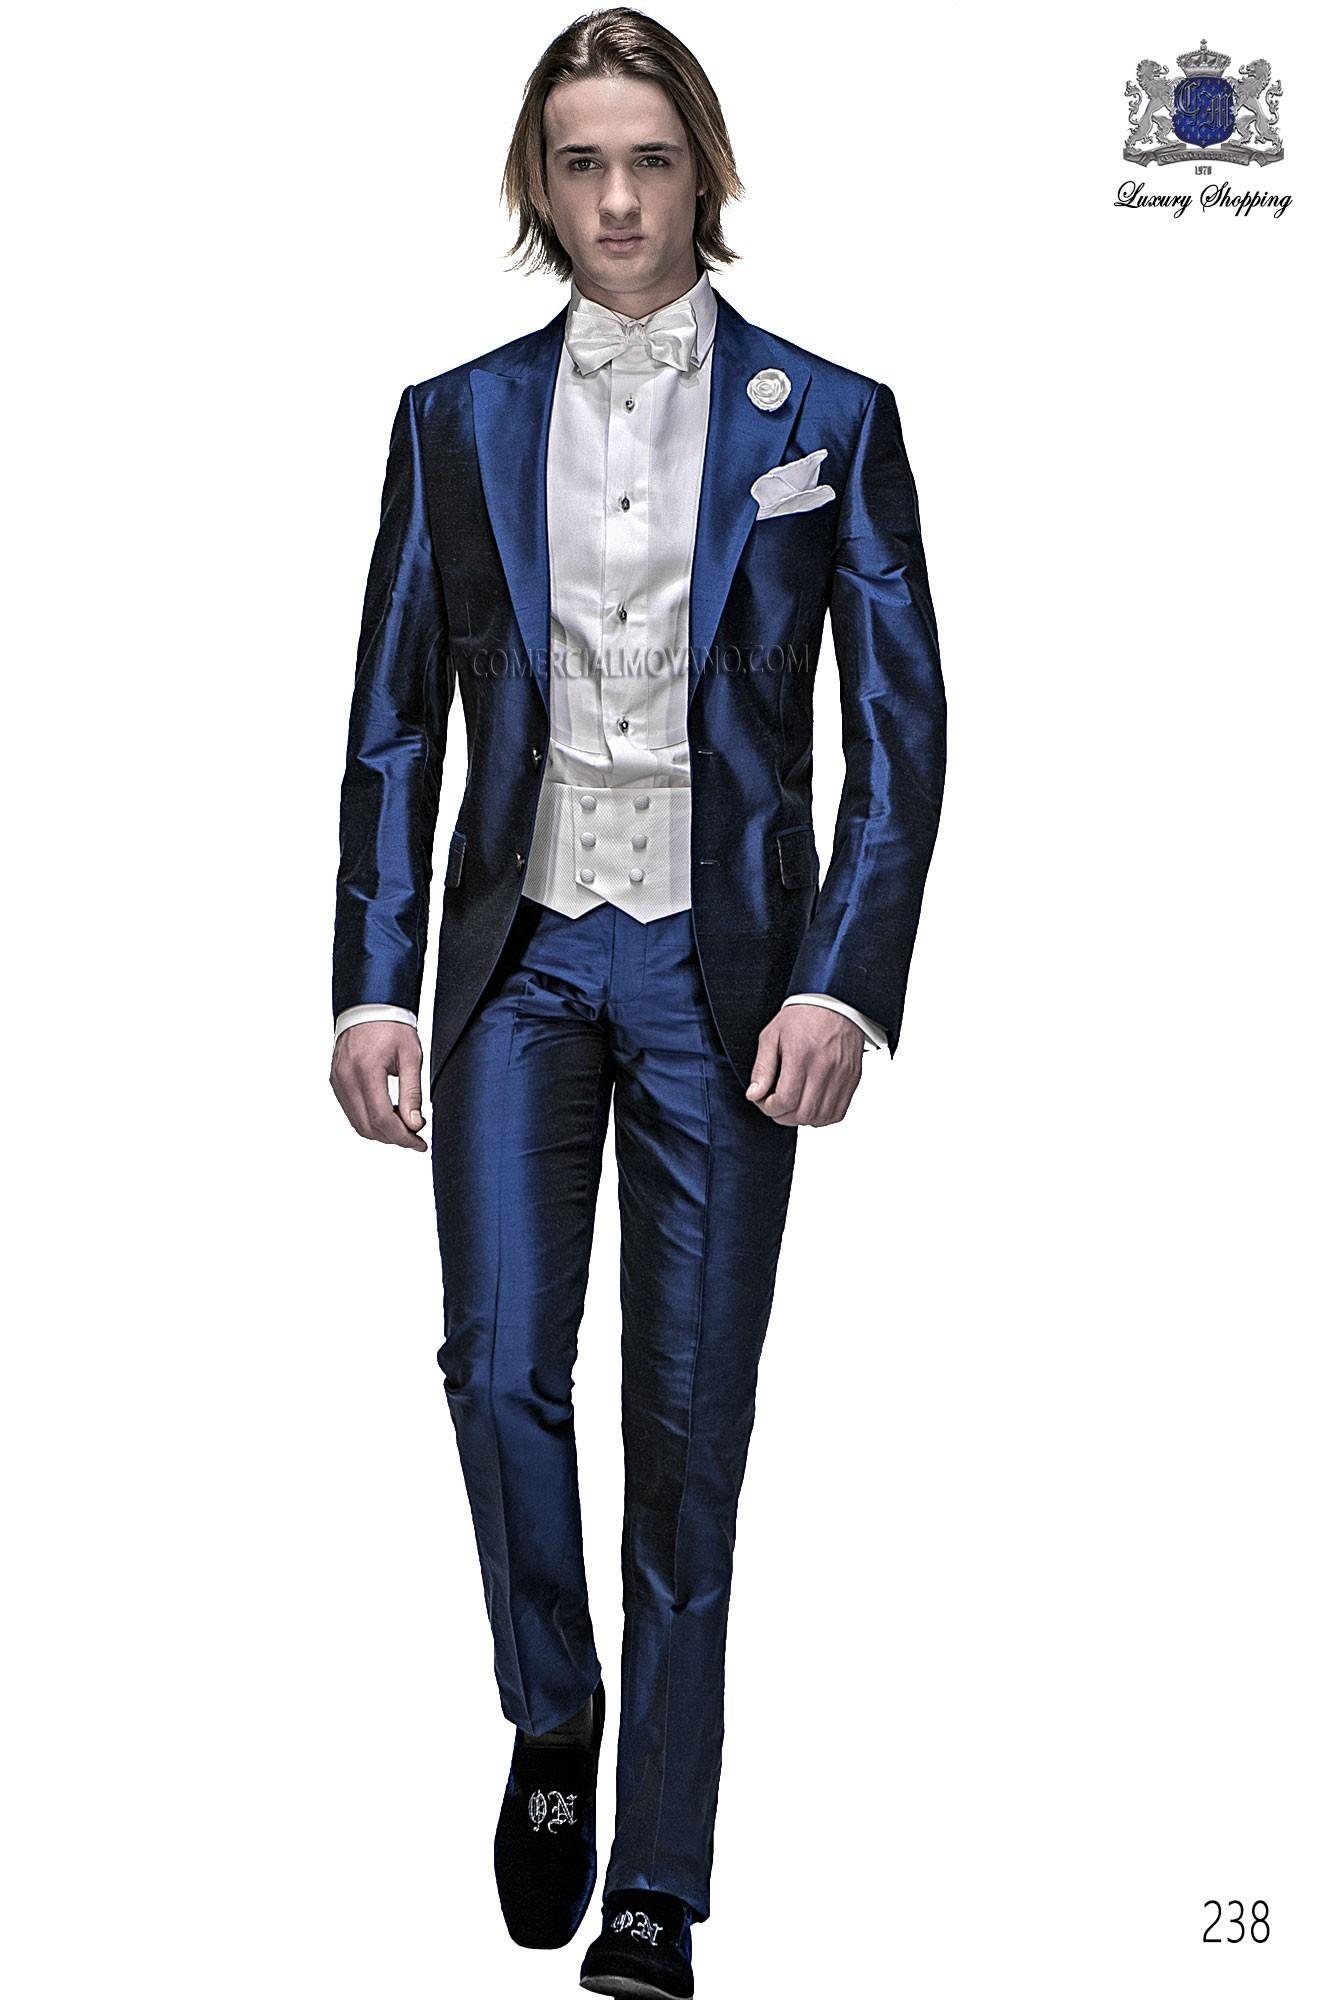 Fashion royal blue men wedding suit model 238 Ottavio Nuccio Gala